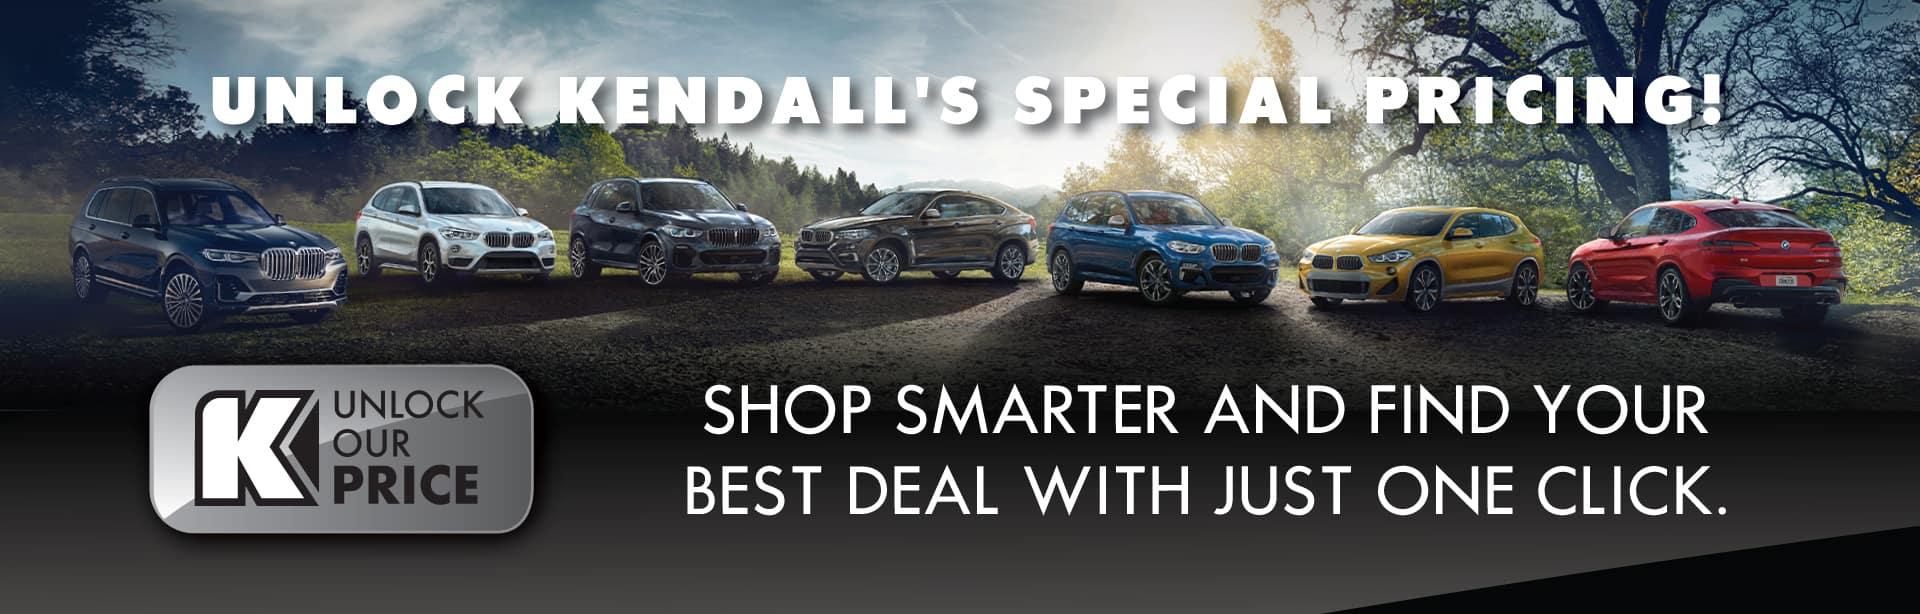 BMW of Bend Unlock Pricing